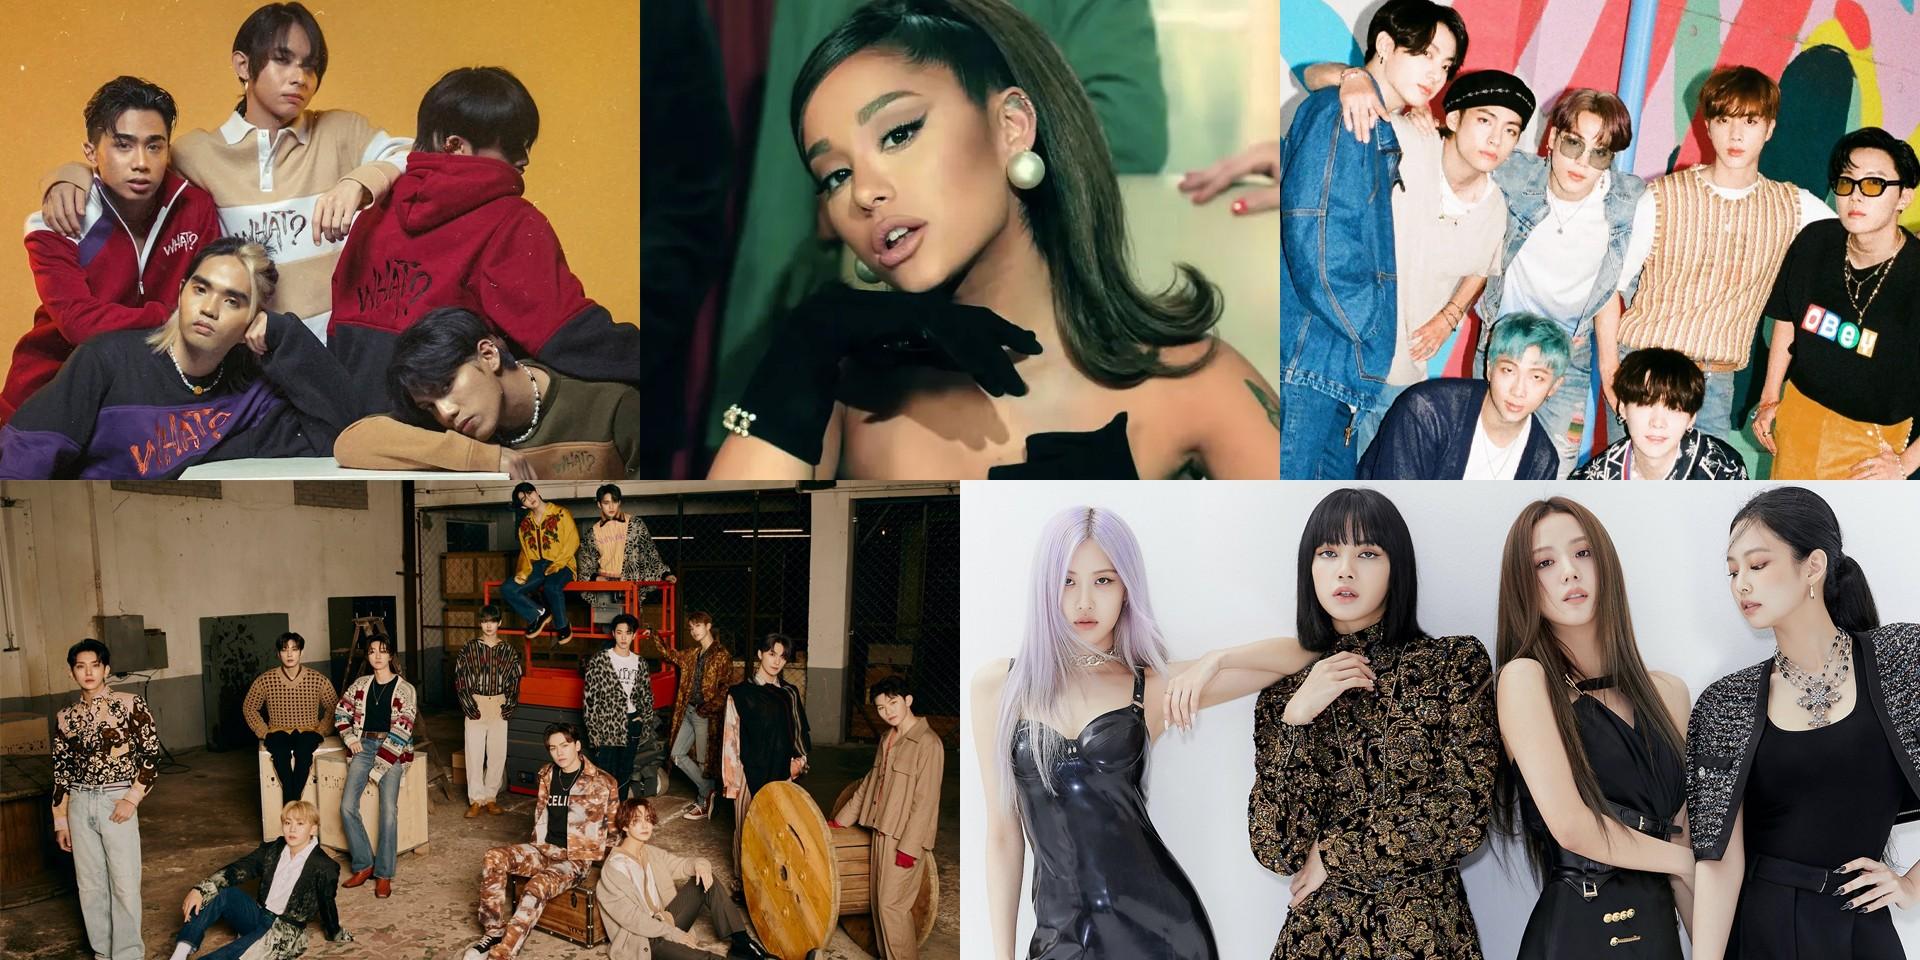 The fandoms that made BTS, BLACKPINK, SB19, Ariana Grande, and SEVENTEEN finalists at the Billboard Music Awards Top Social Artist Chart